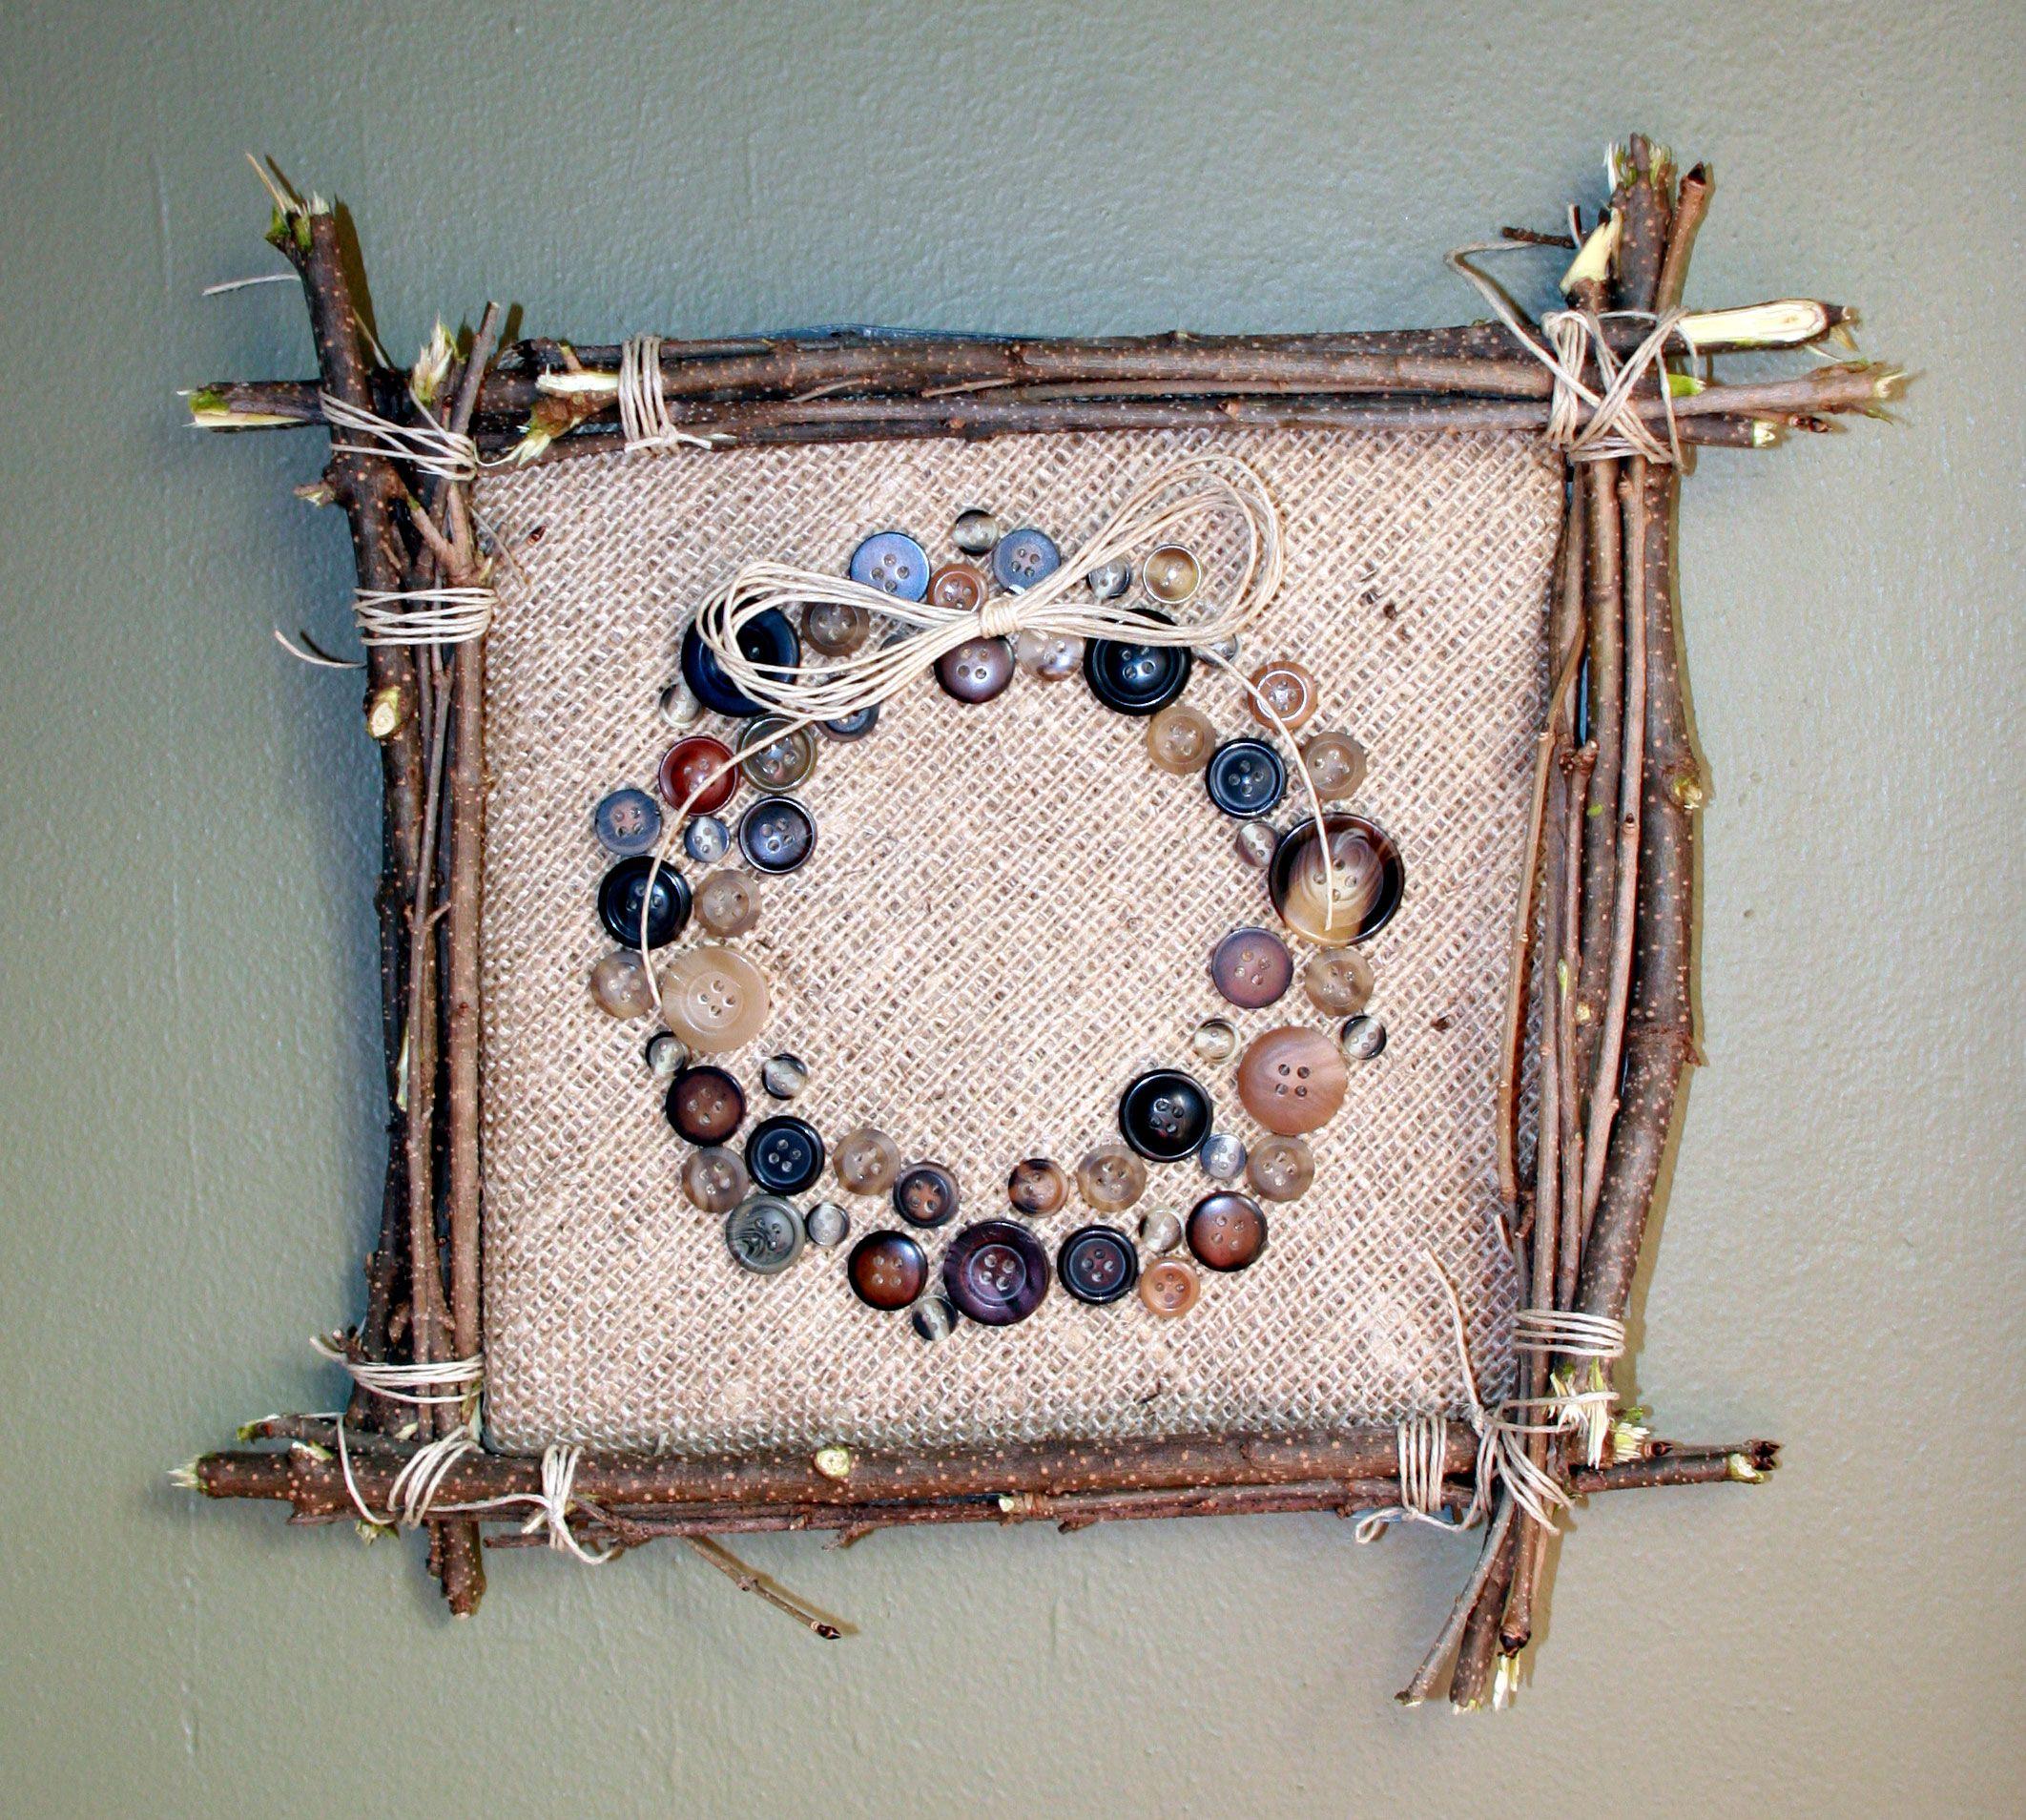 DIY rustic twig frame burlap jute fabric background over cardboard